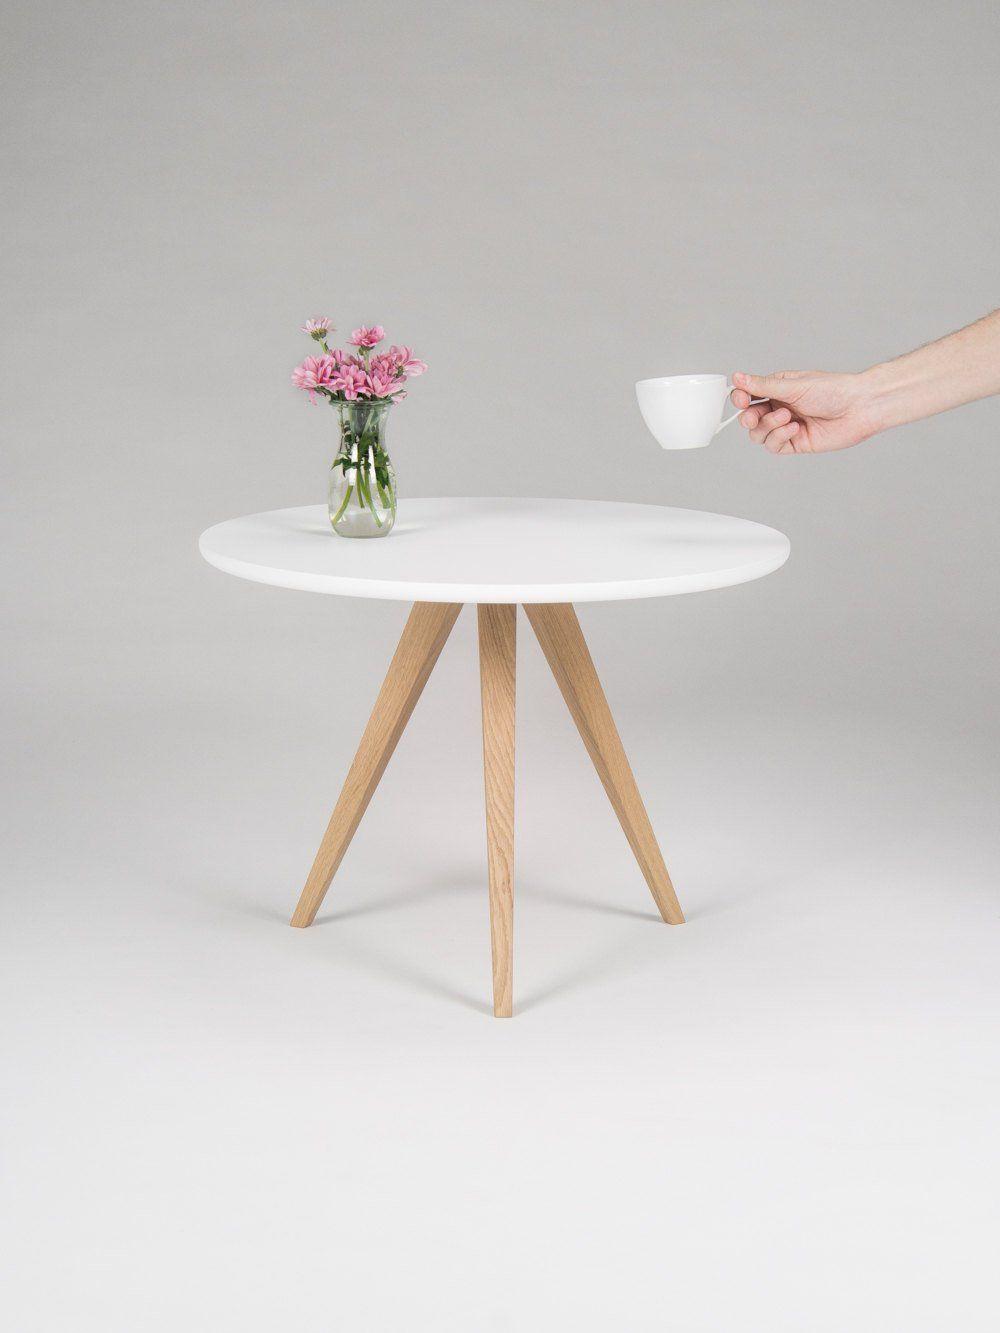 43+ White oak coffee table circle ideas in 2021